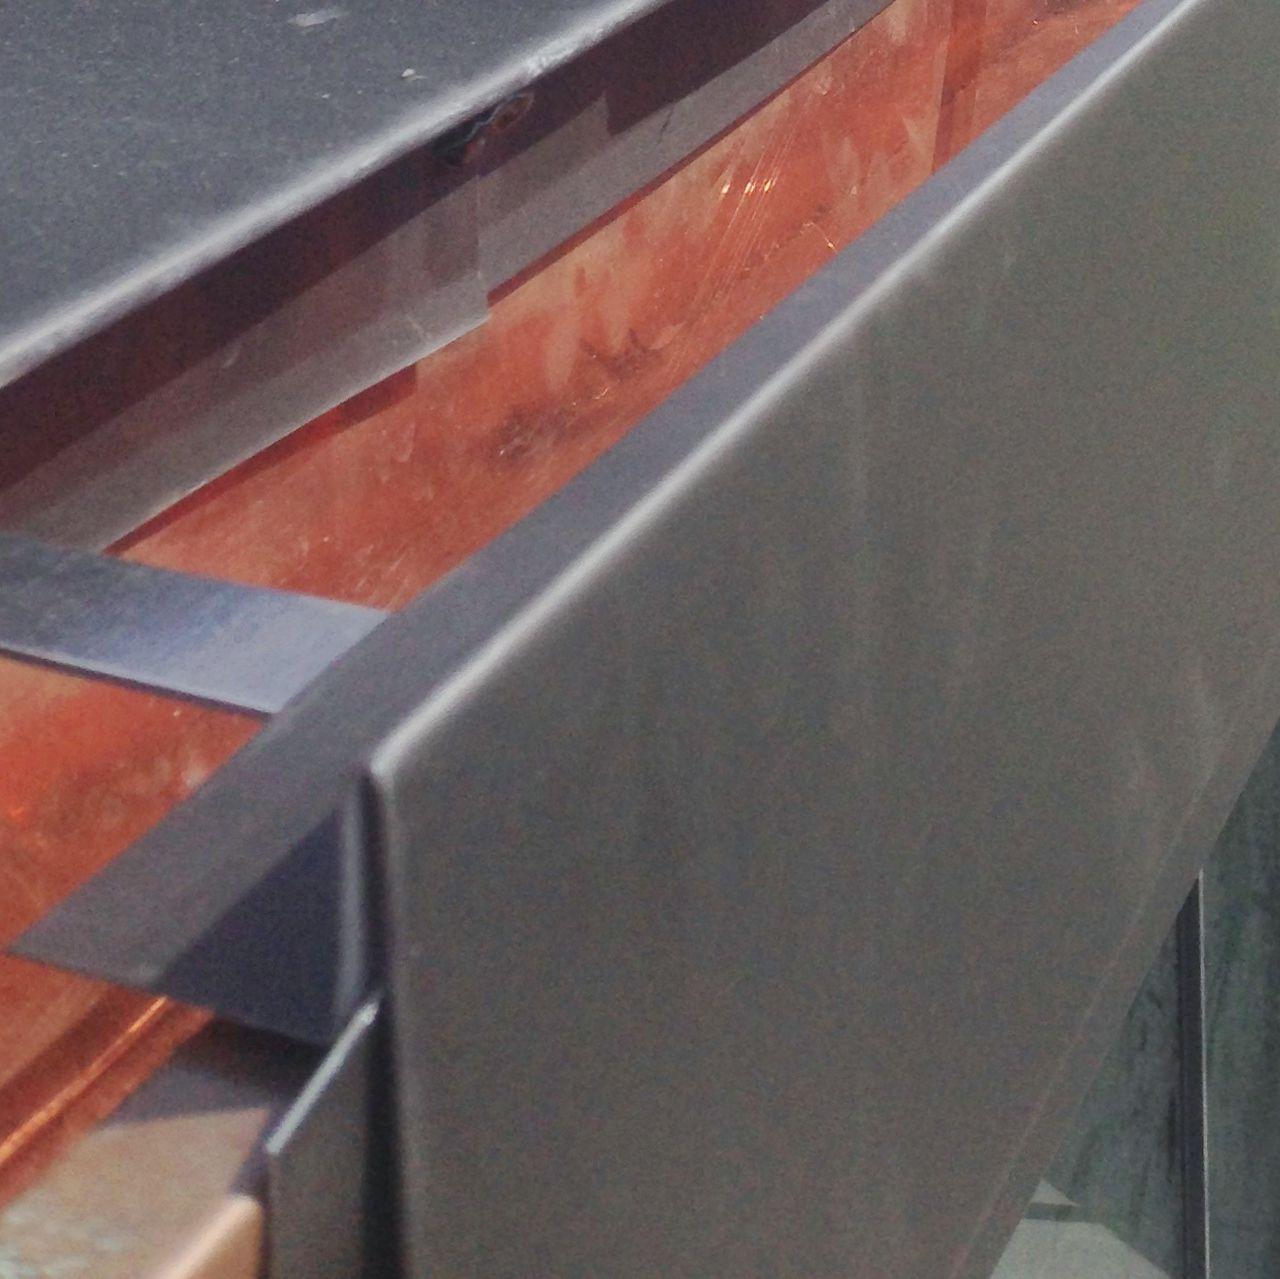 Wm Zinc Roof And Gutters In 2020 Zinc Roof Gutters Stainless Steel Brackets